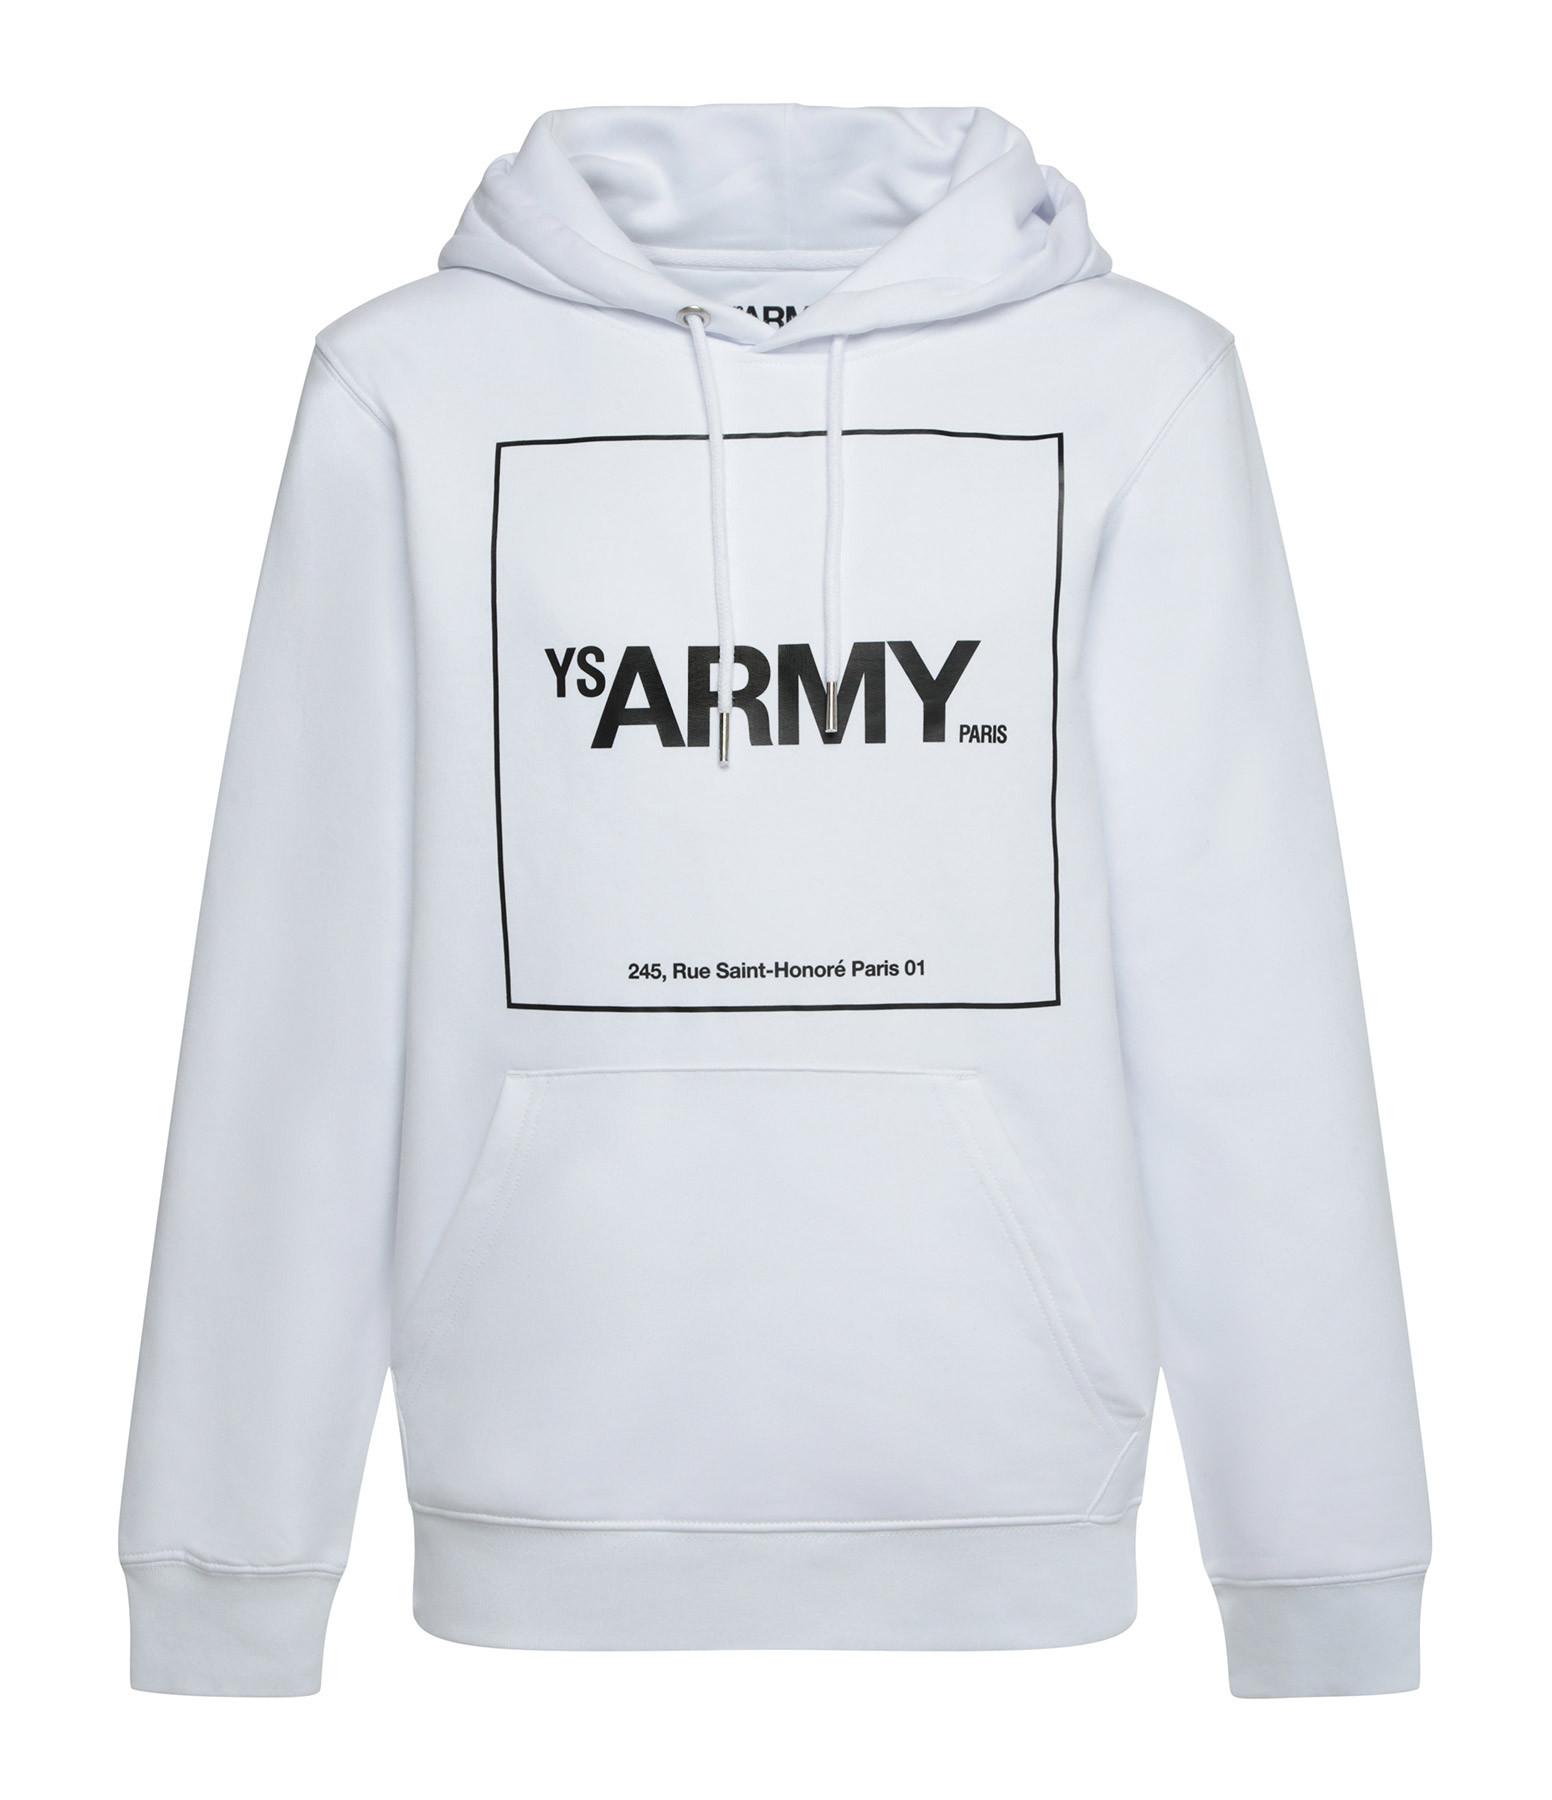 YVES SALOMON - ARMY - Sweatshirt Coton Blanc